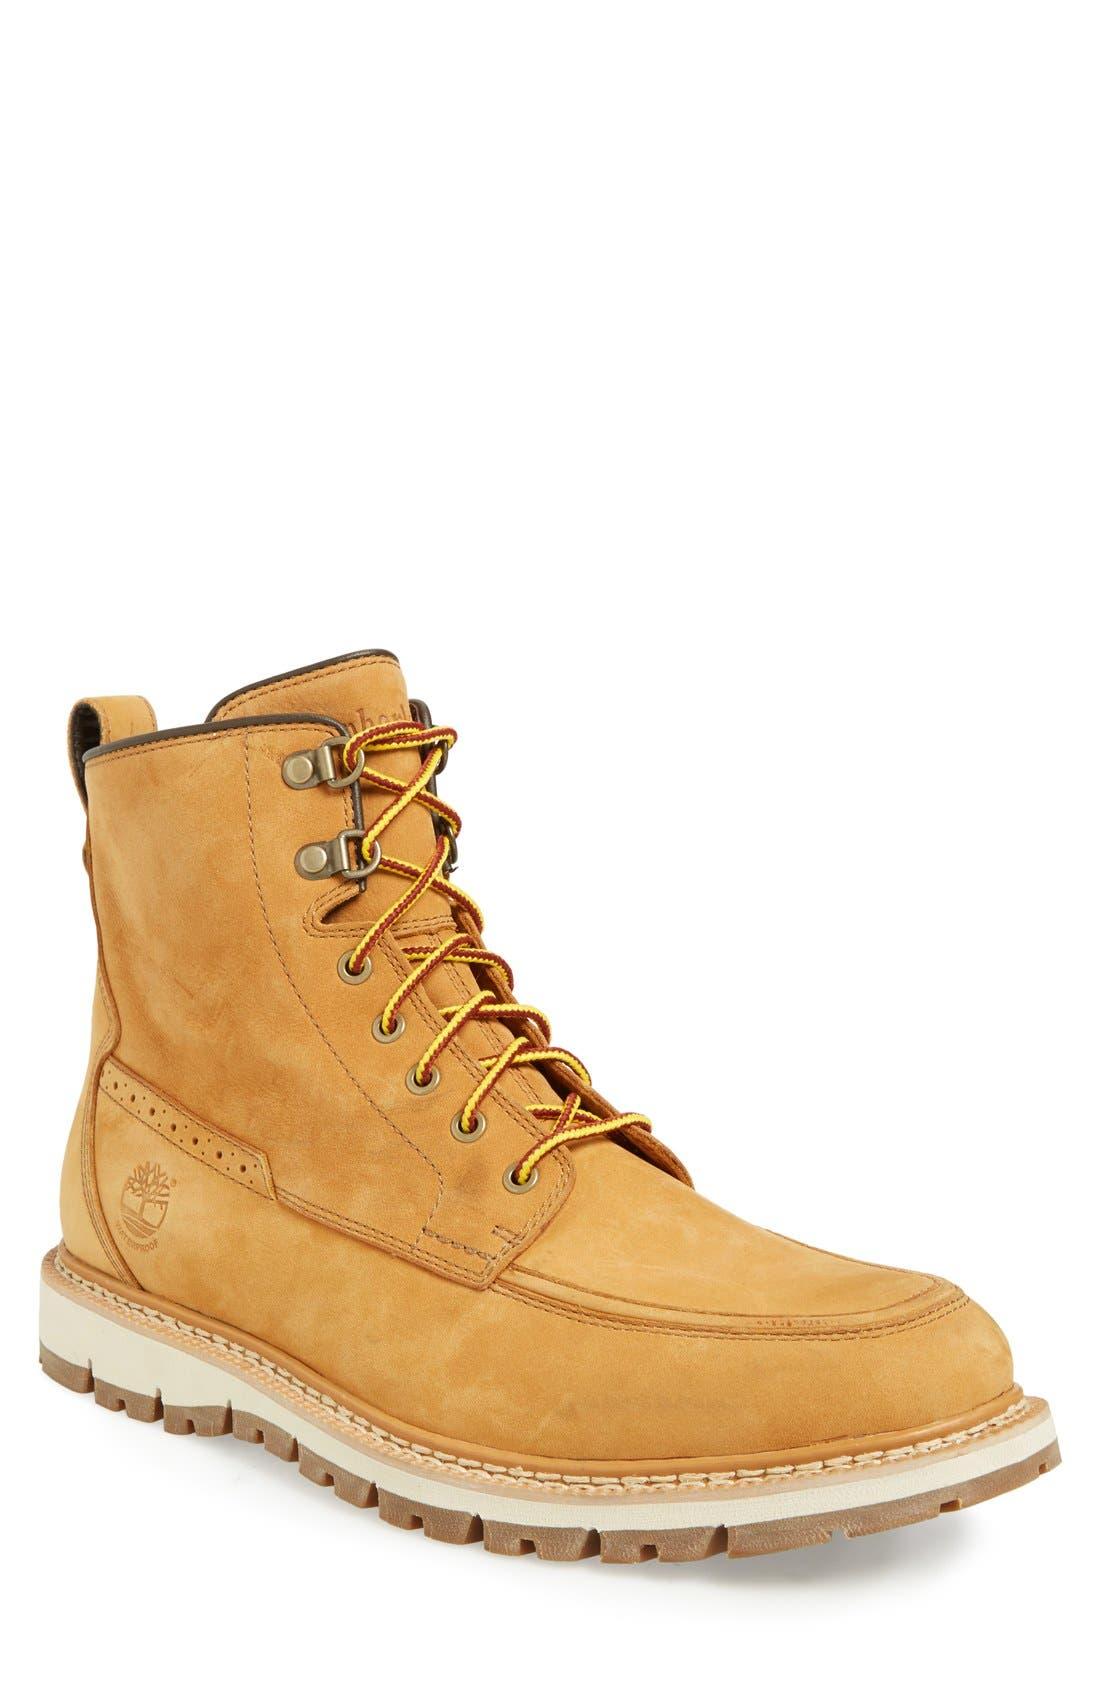 Main Image - Timberland 'Britton Hill' Moc Toe Boot (Men)